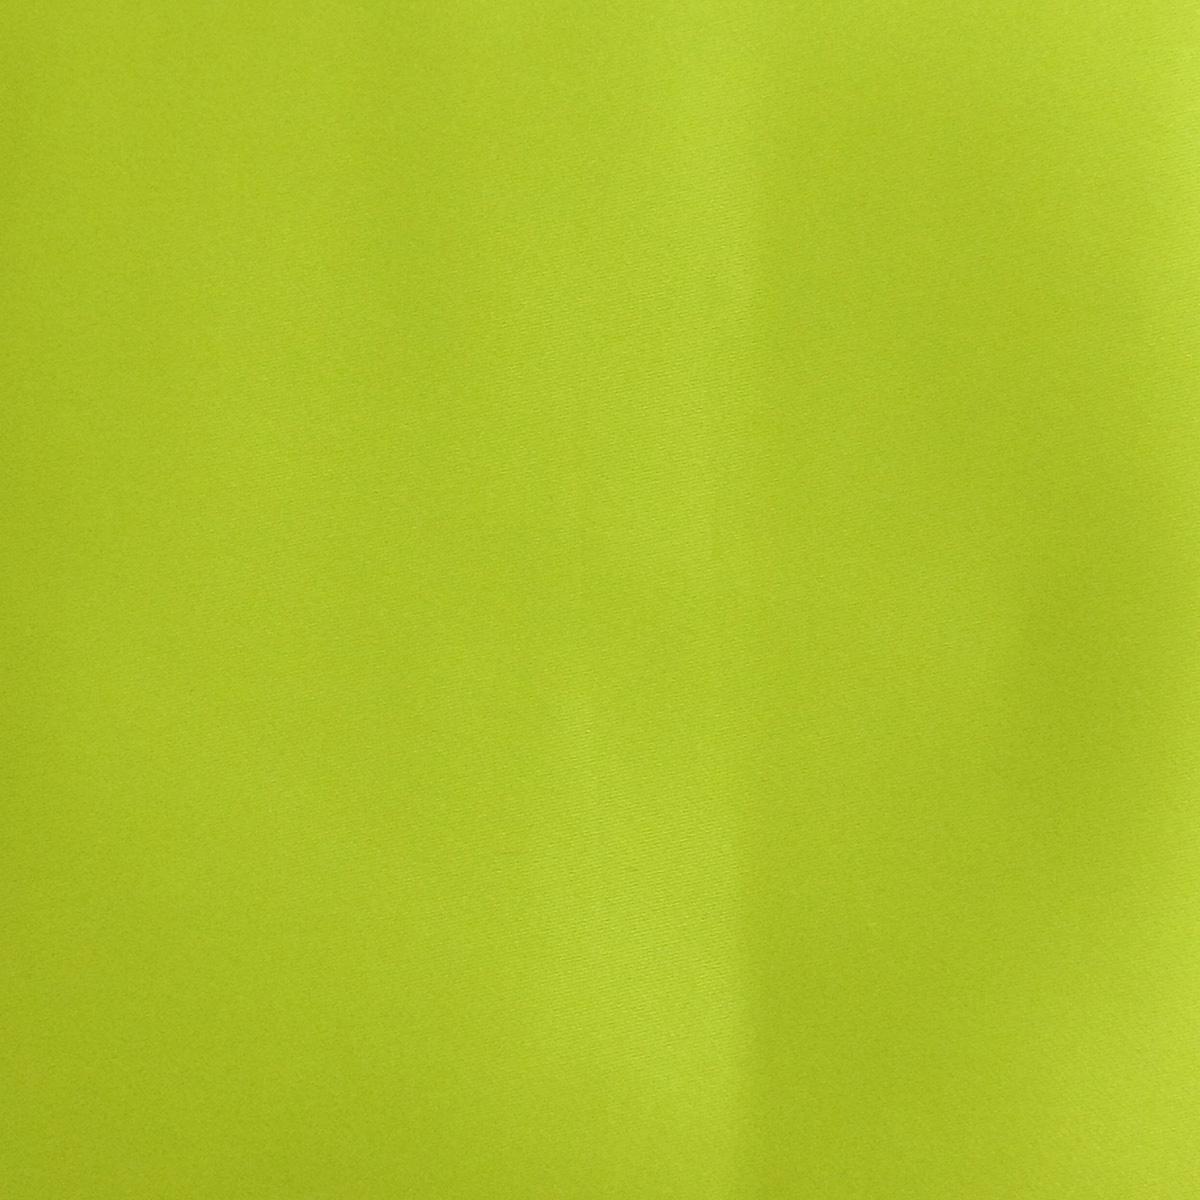 B1764 20 lime mens ties facemasks con murphys menswear cork - - Con Murphys Menswear